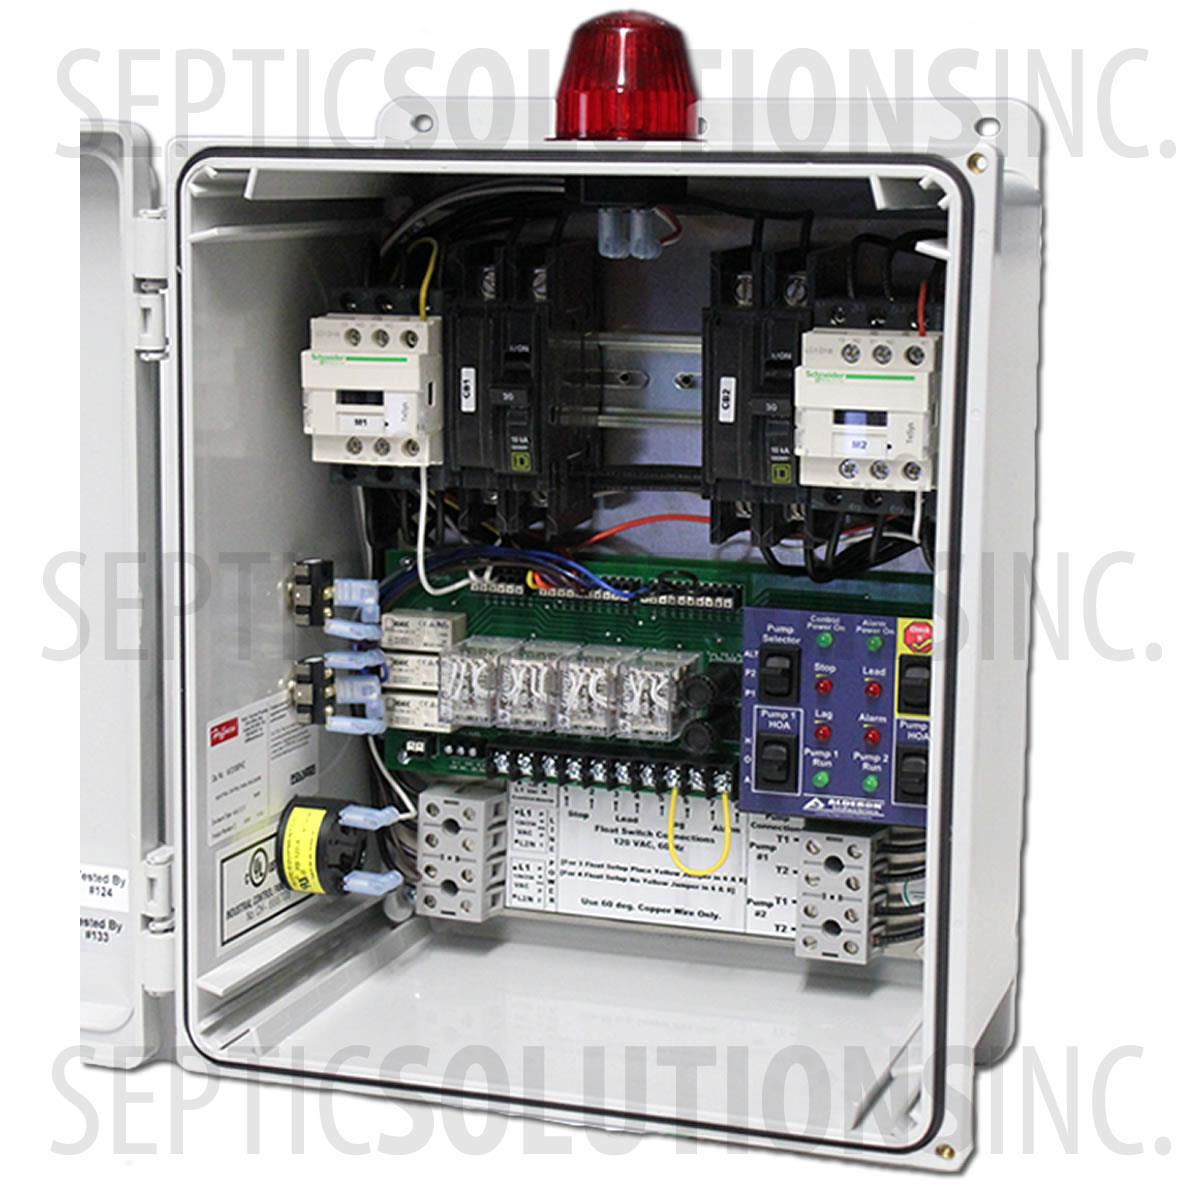 duplex sewage pump control panels free same day shipping rh septicsolutions com